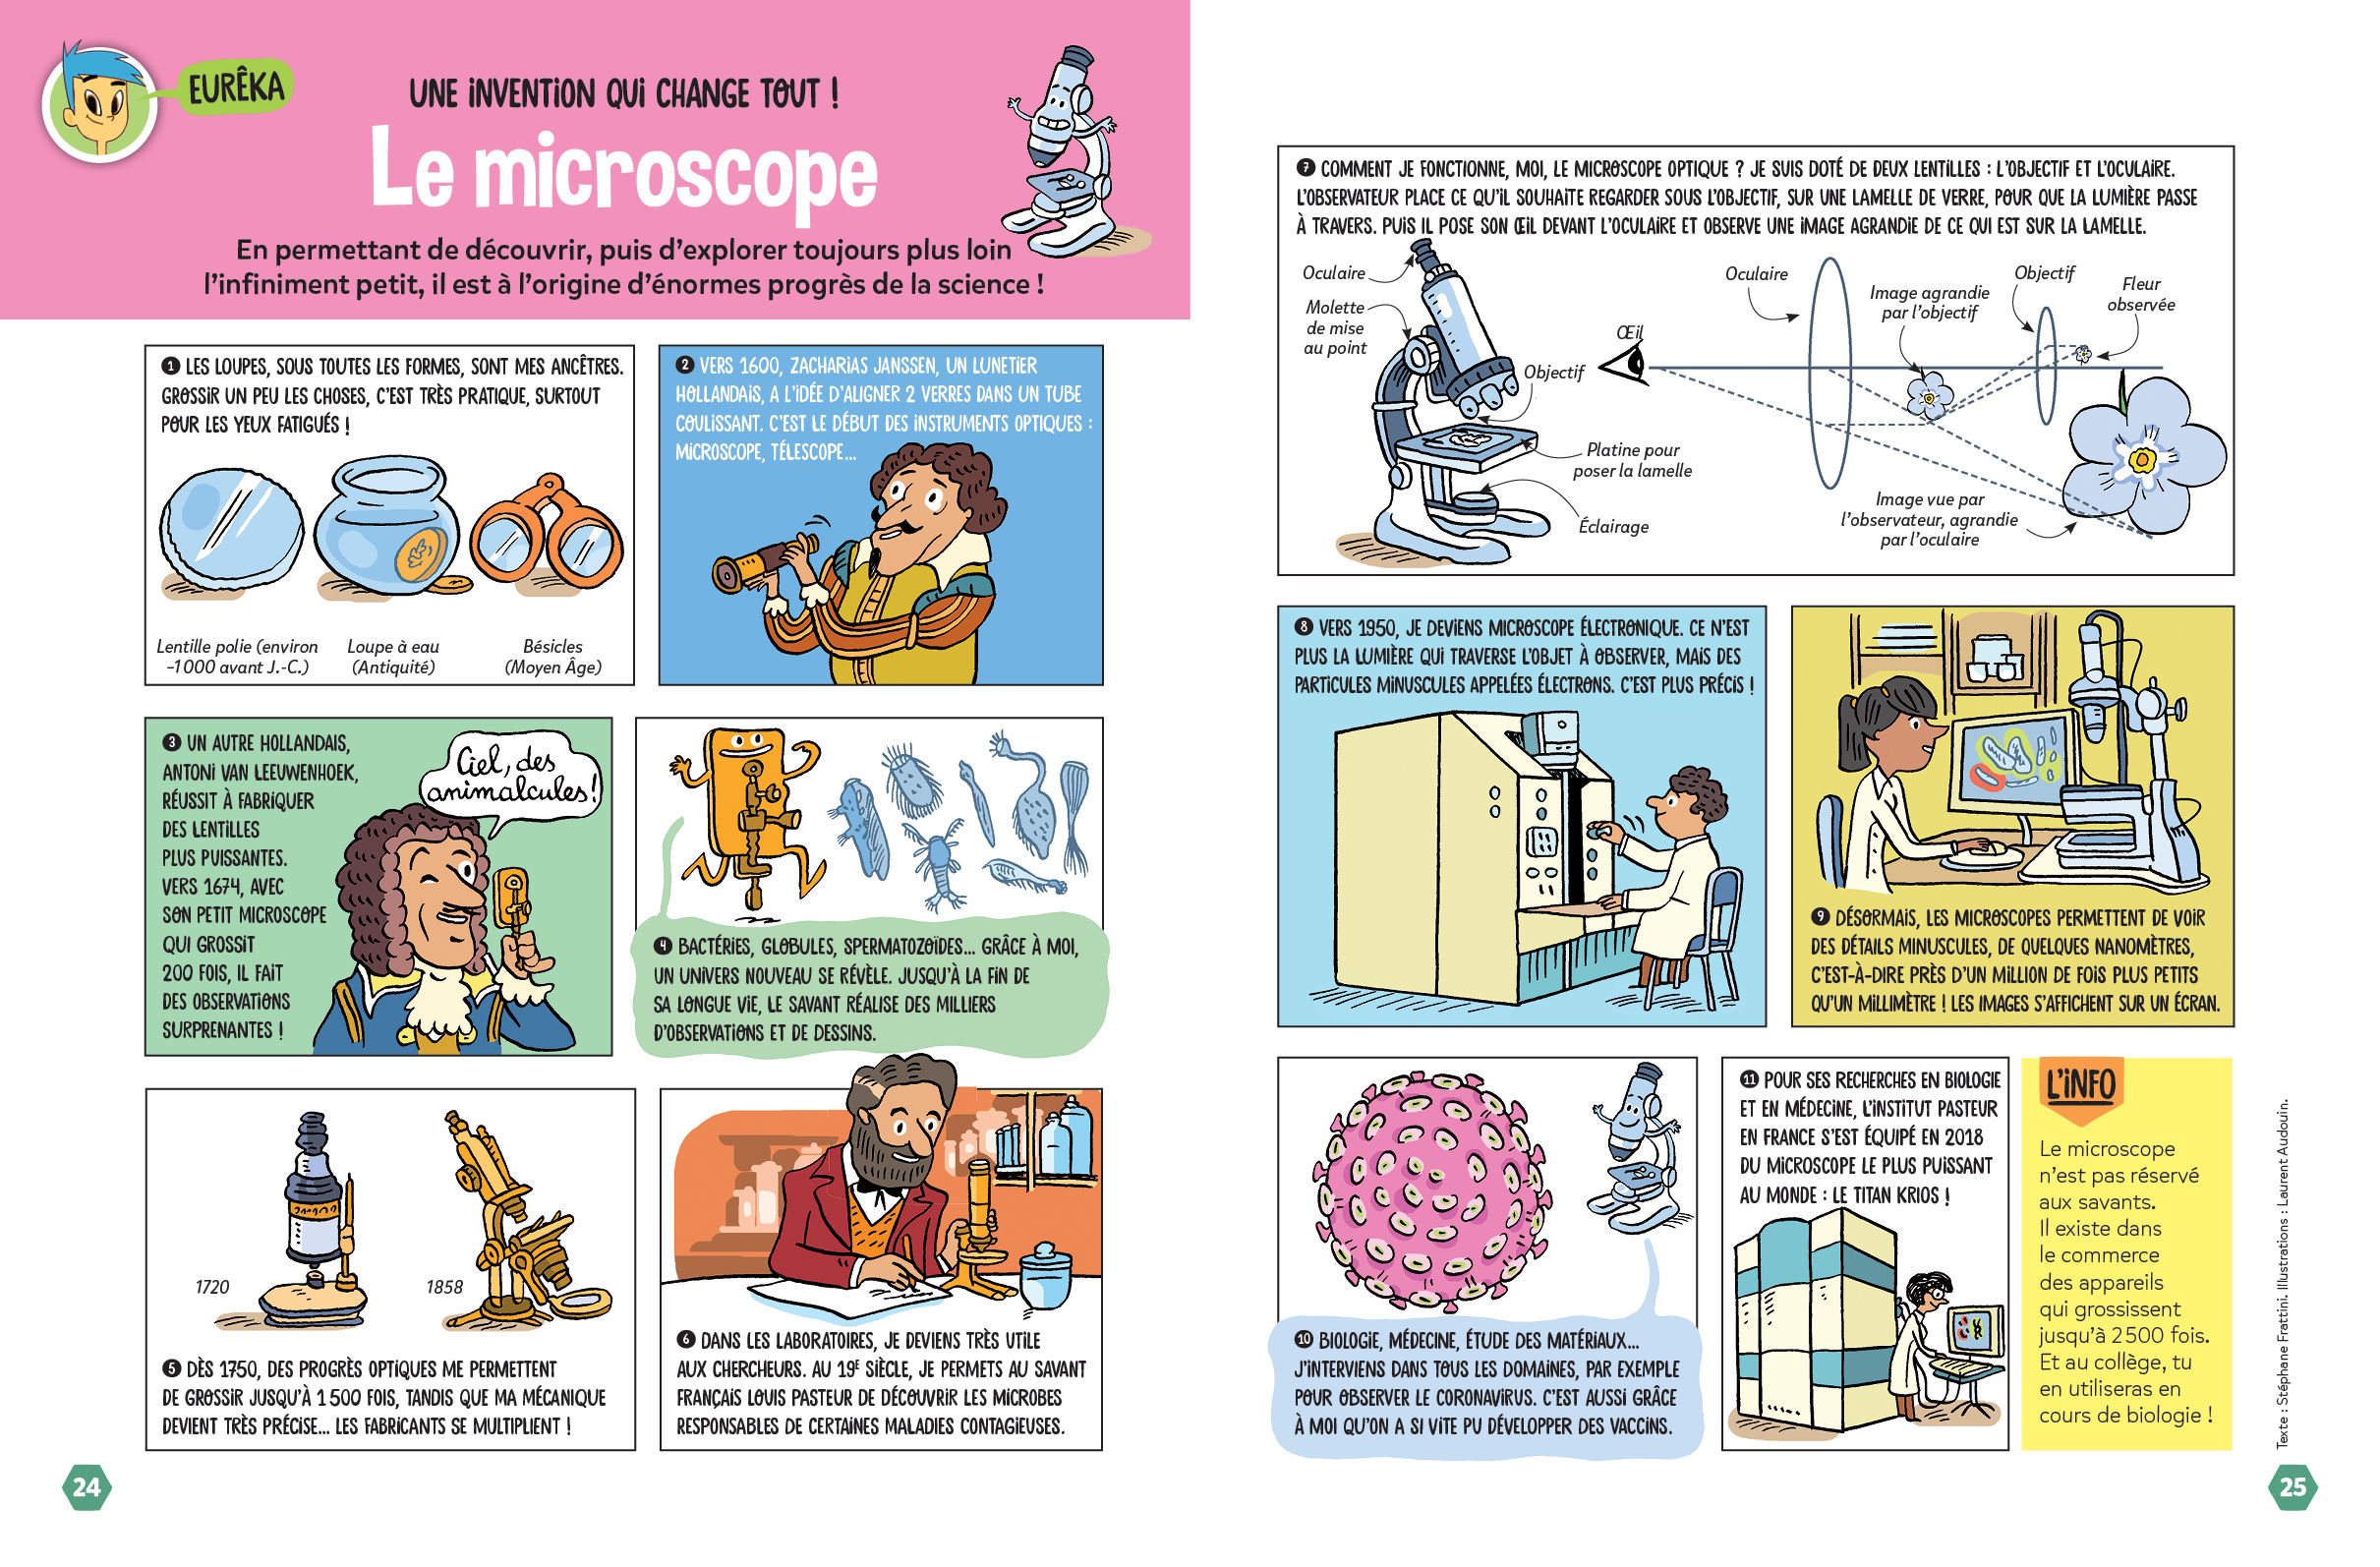 Invention du microscope